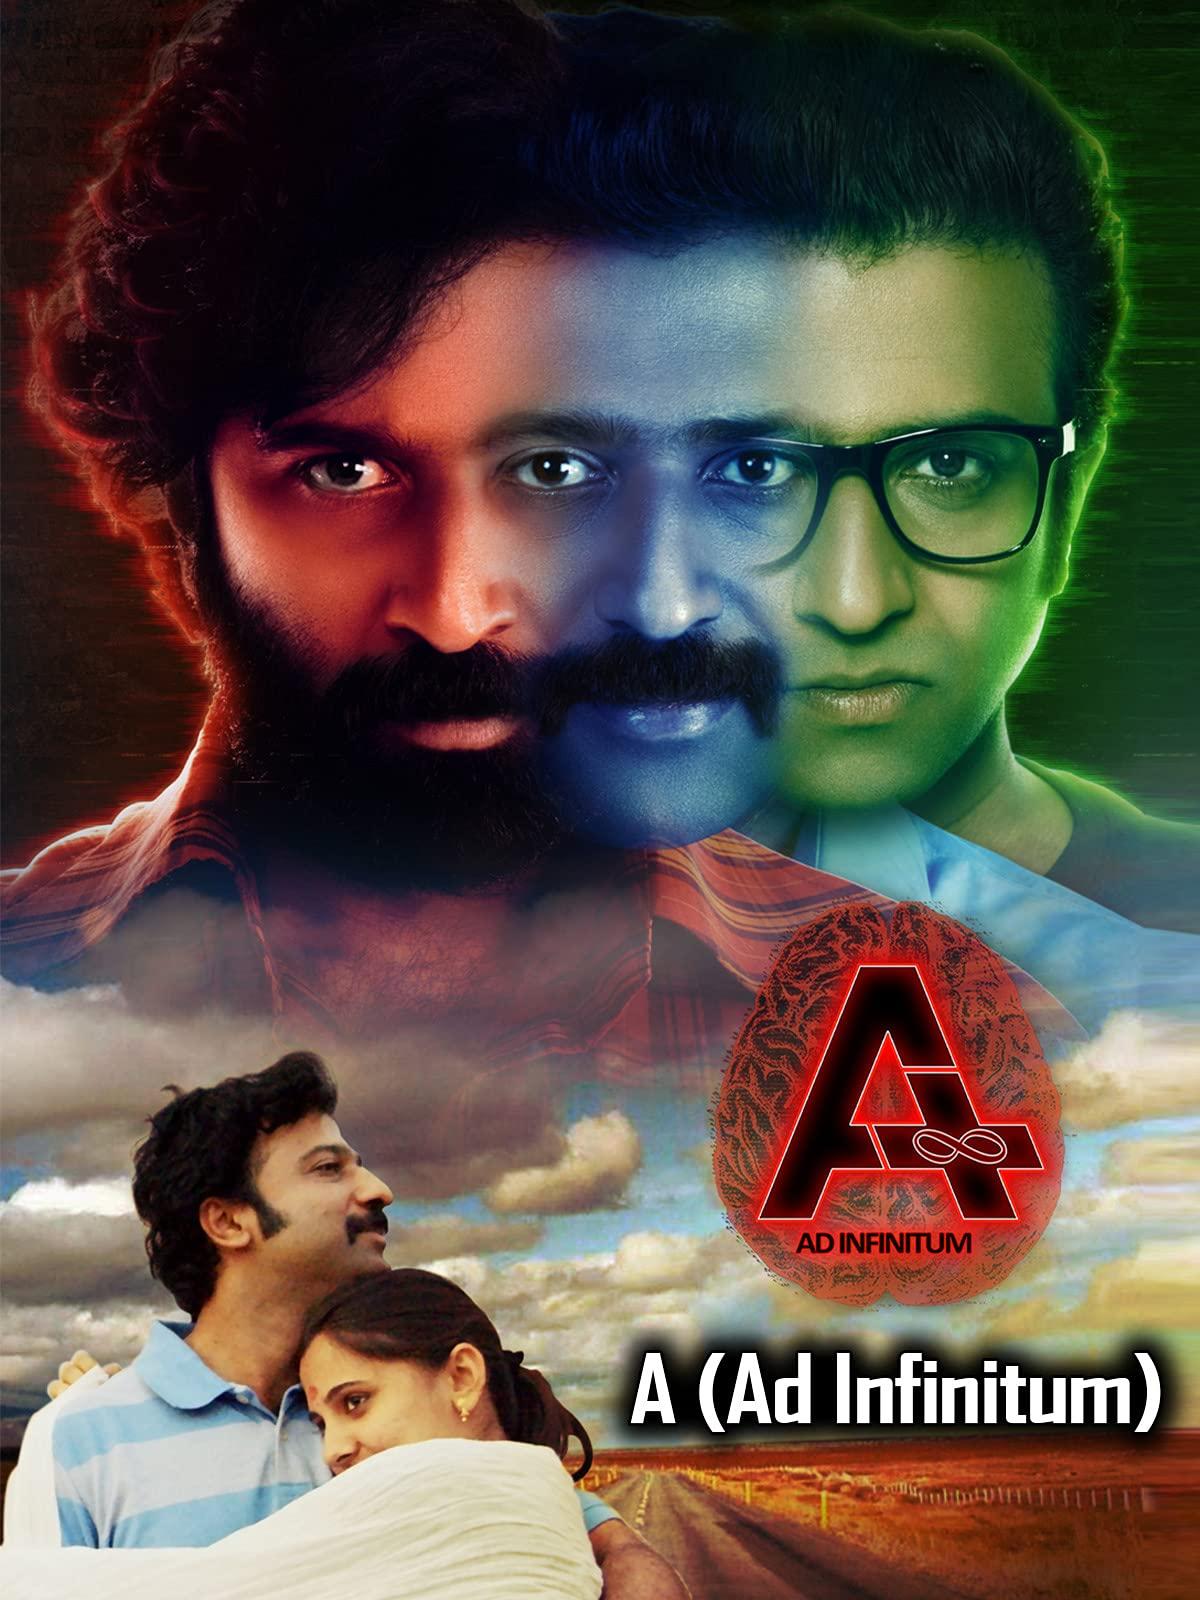 A Ad Infinitum (2021) Hindi Dubbed (FanDub) 480p UNCUT HDRip ESubs 450MB Download